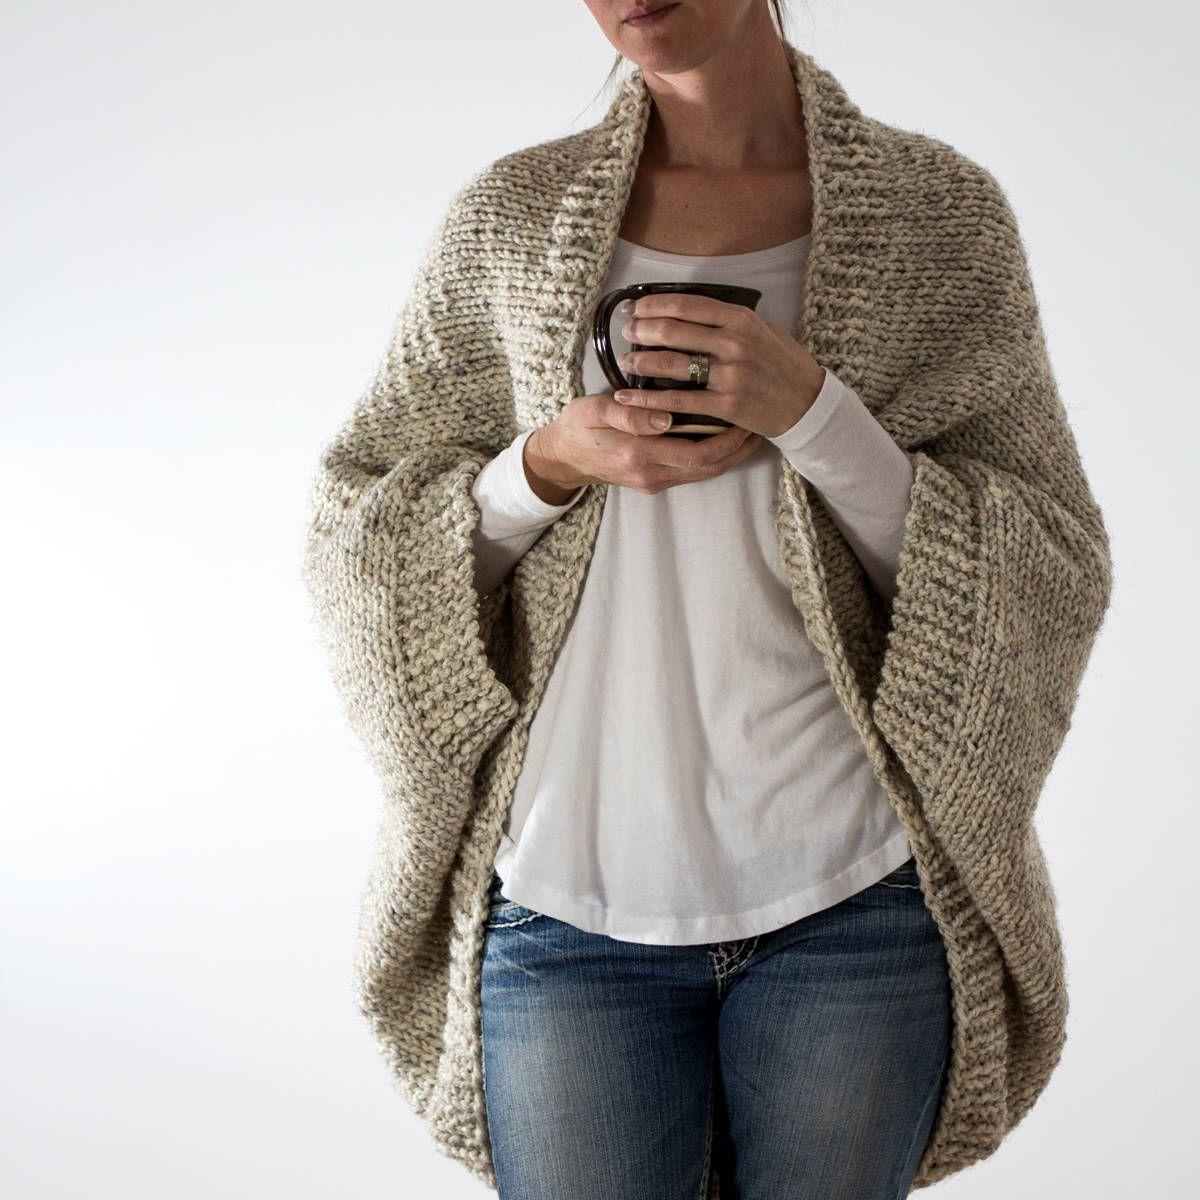 Knitting Pattern Oversized Scoop Sweater Knit